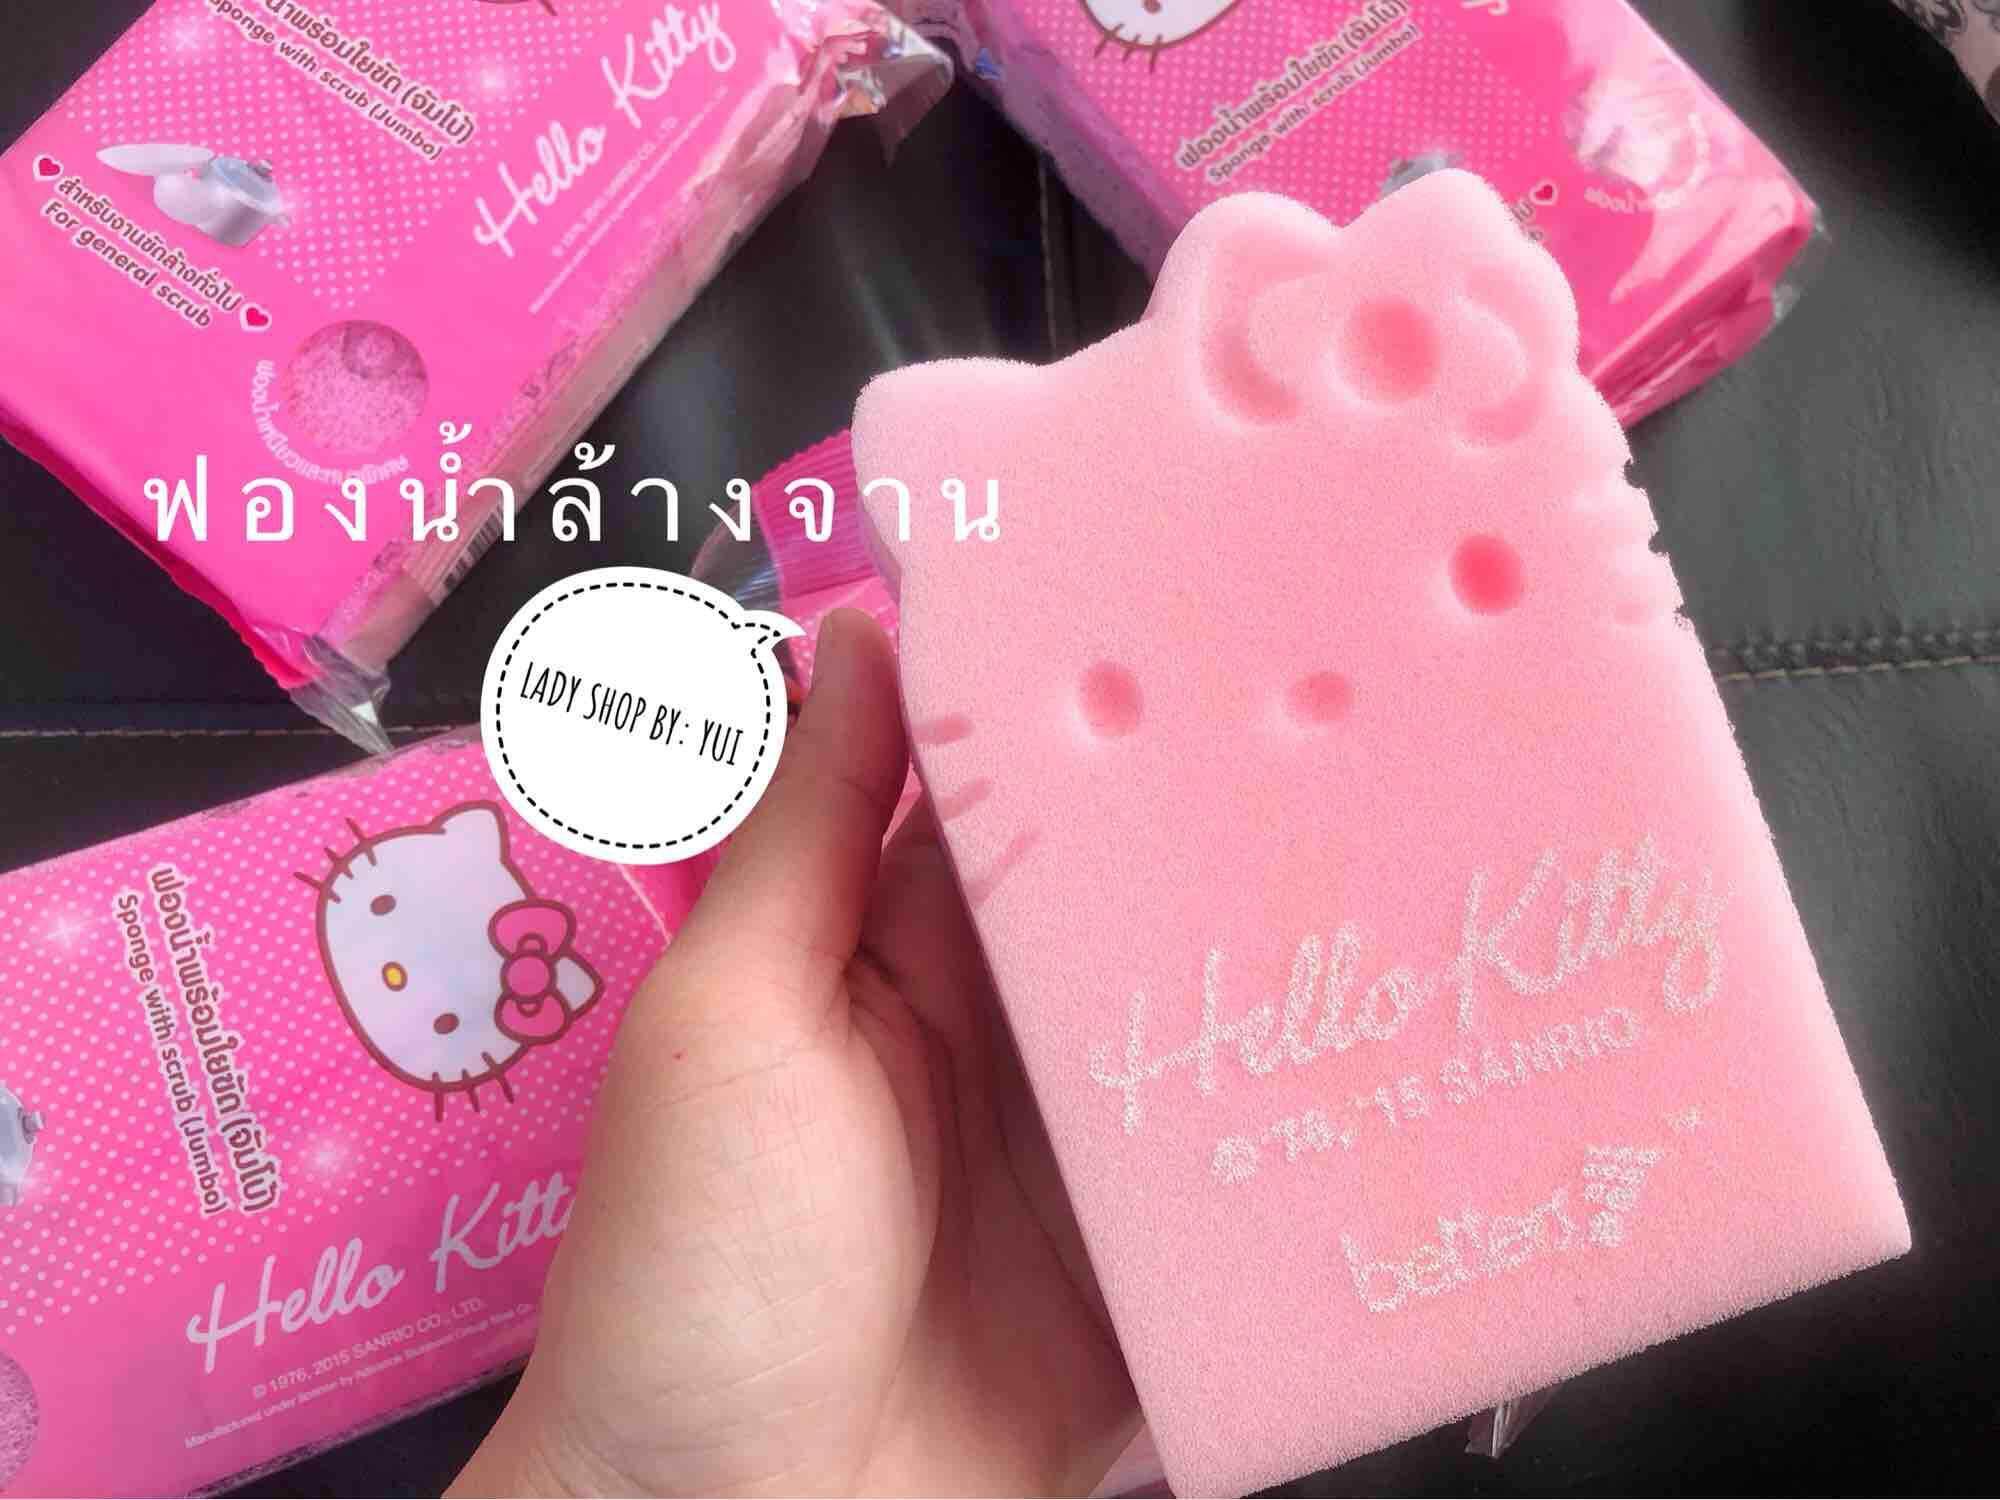 ❤️ ฟองน้ำล้างจาน Kitty (พร้อมส่ง) By Lady Shopp.